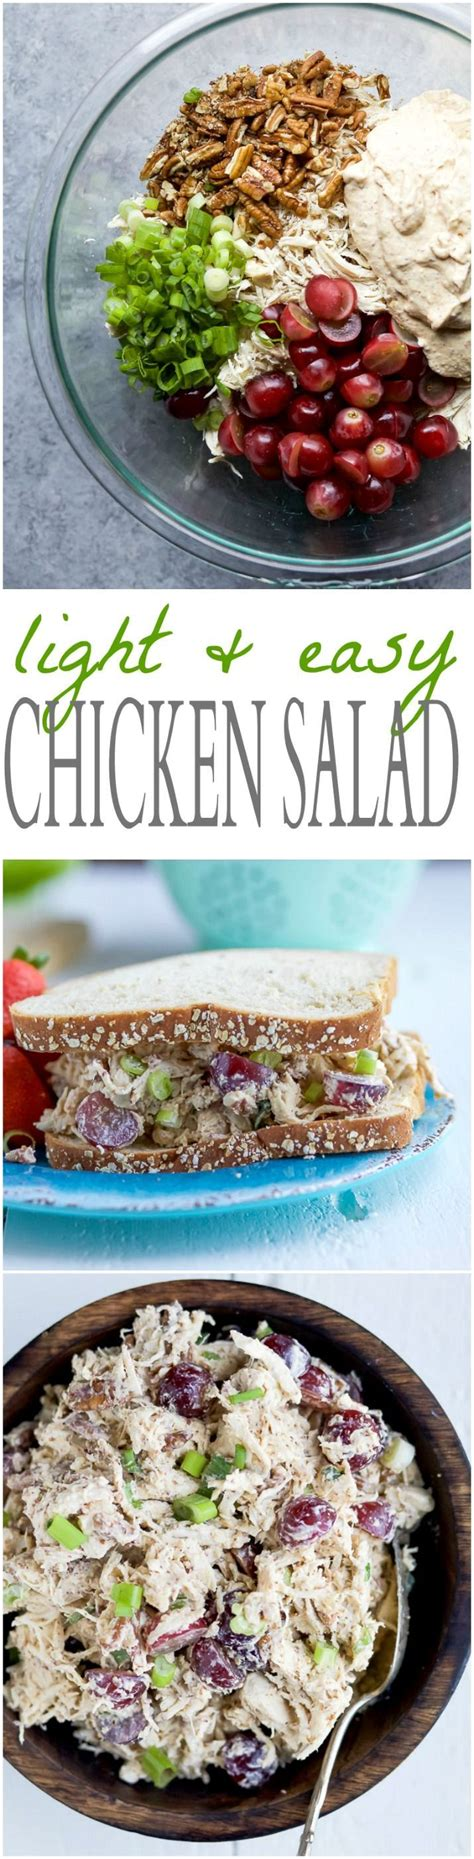 light chicken salad recipe best 25 chicken salad recipes ideas on pinterest best